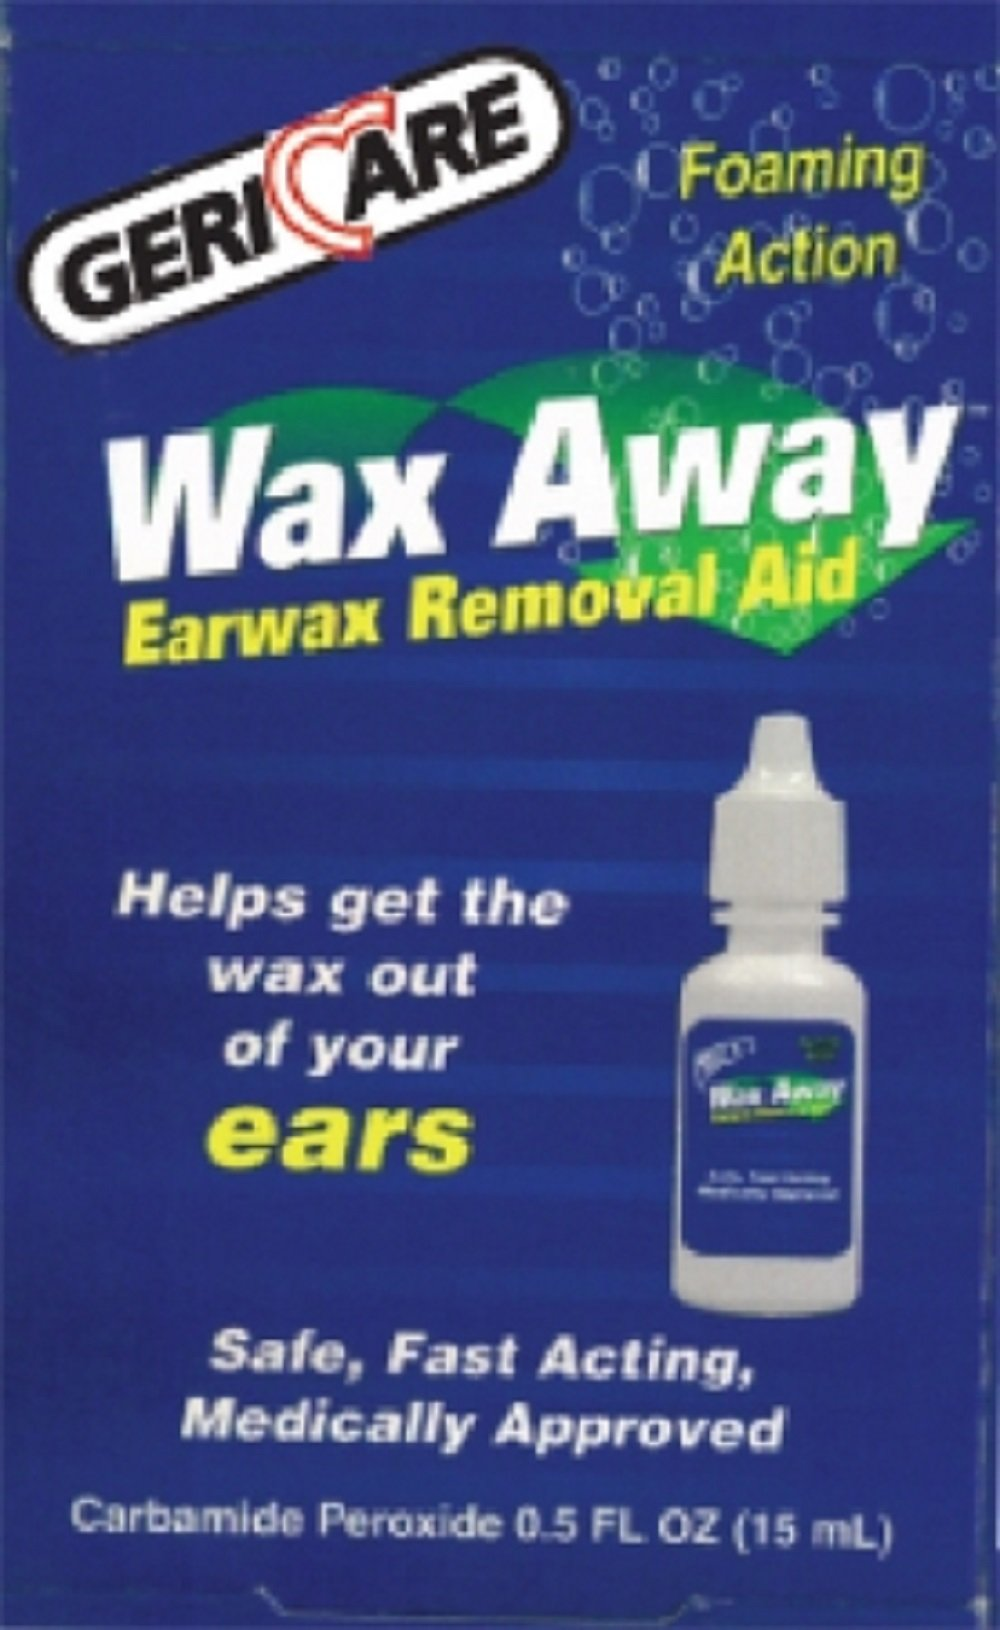 McKesson Brand - Earwax Removal Aid - 0.5 oz. Liquid - Carbamide Peroxide - 24/Case